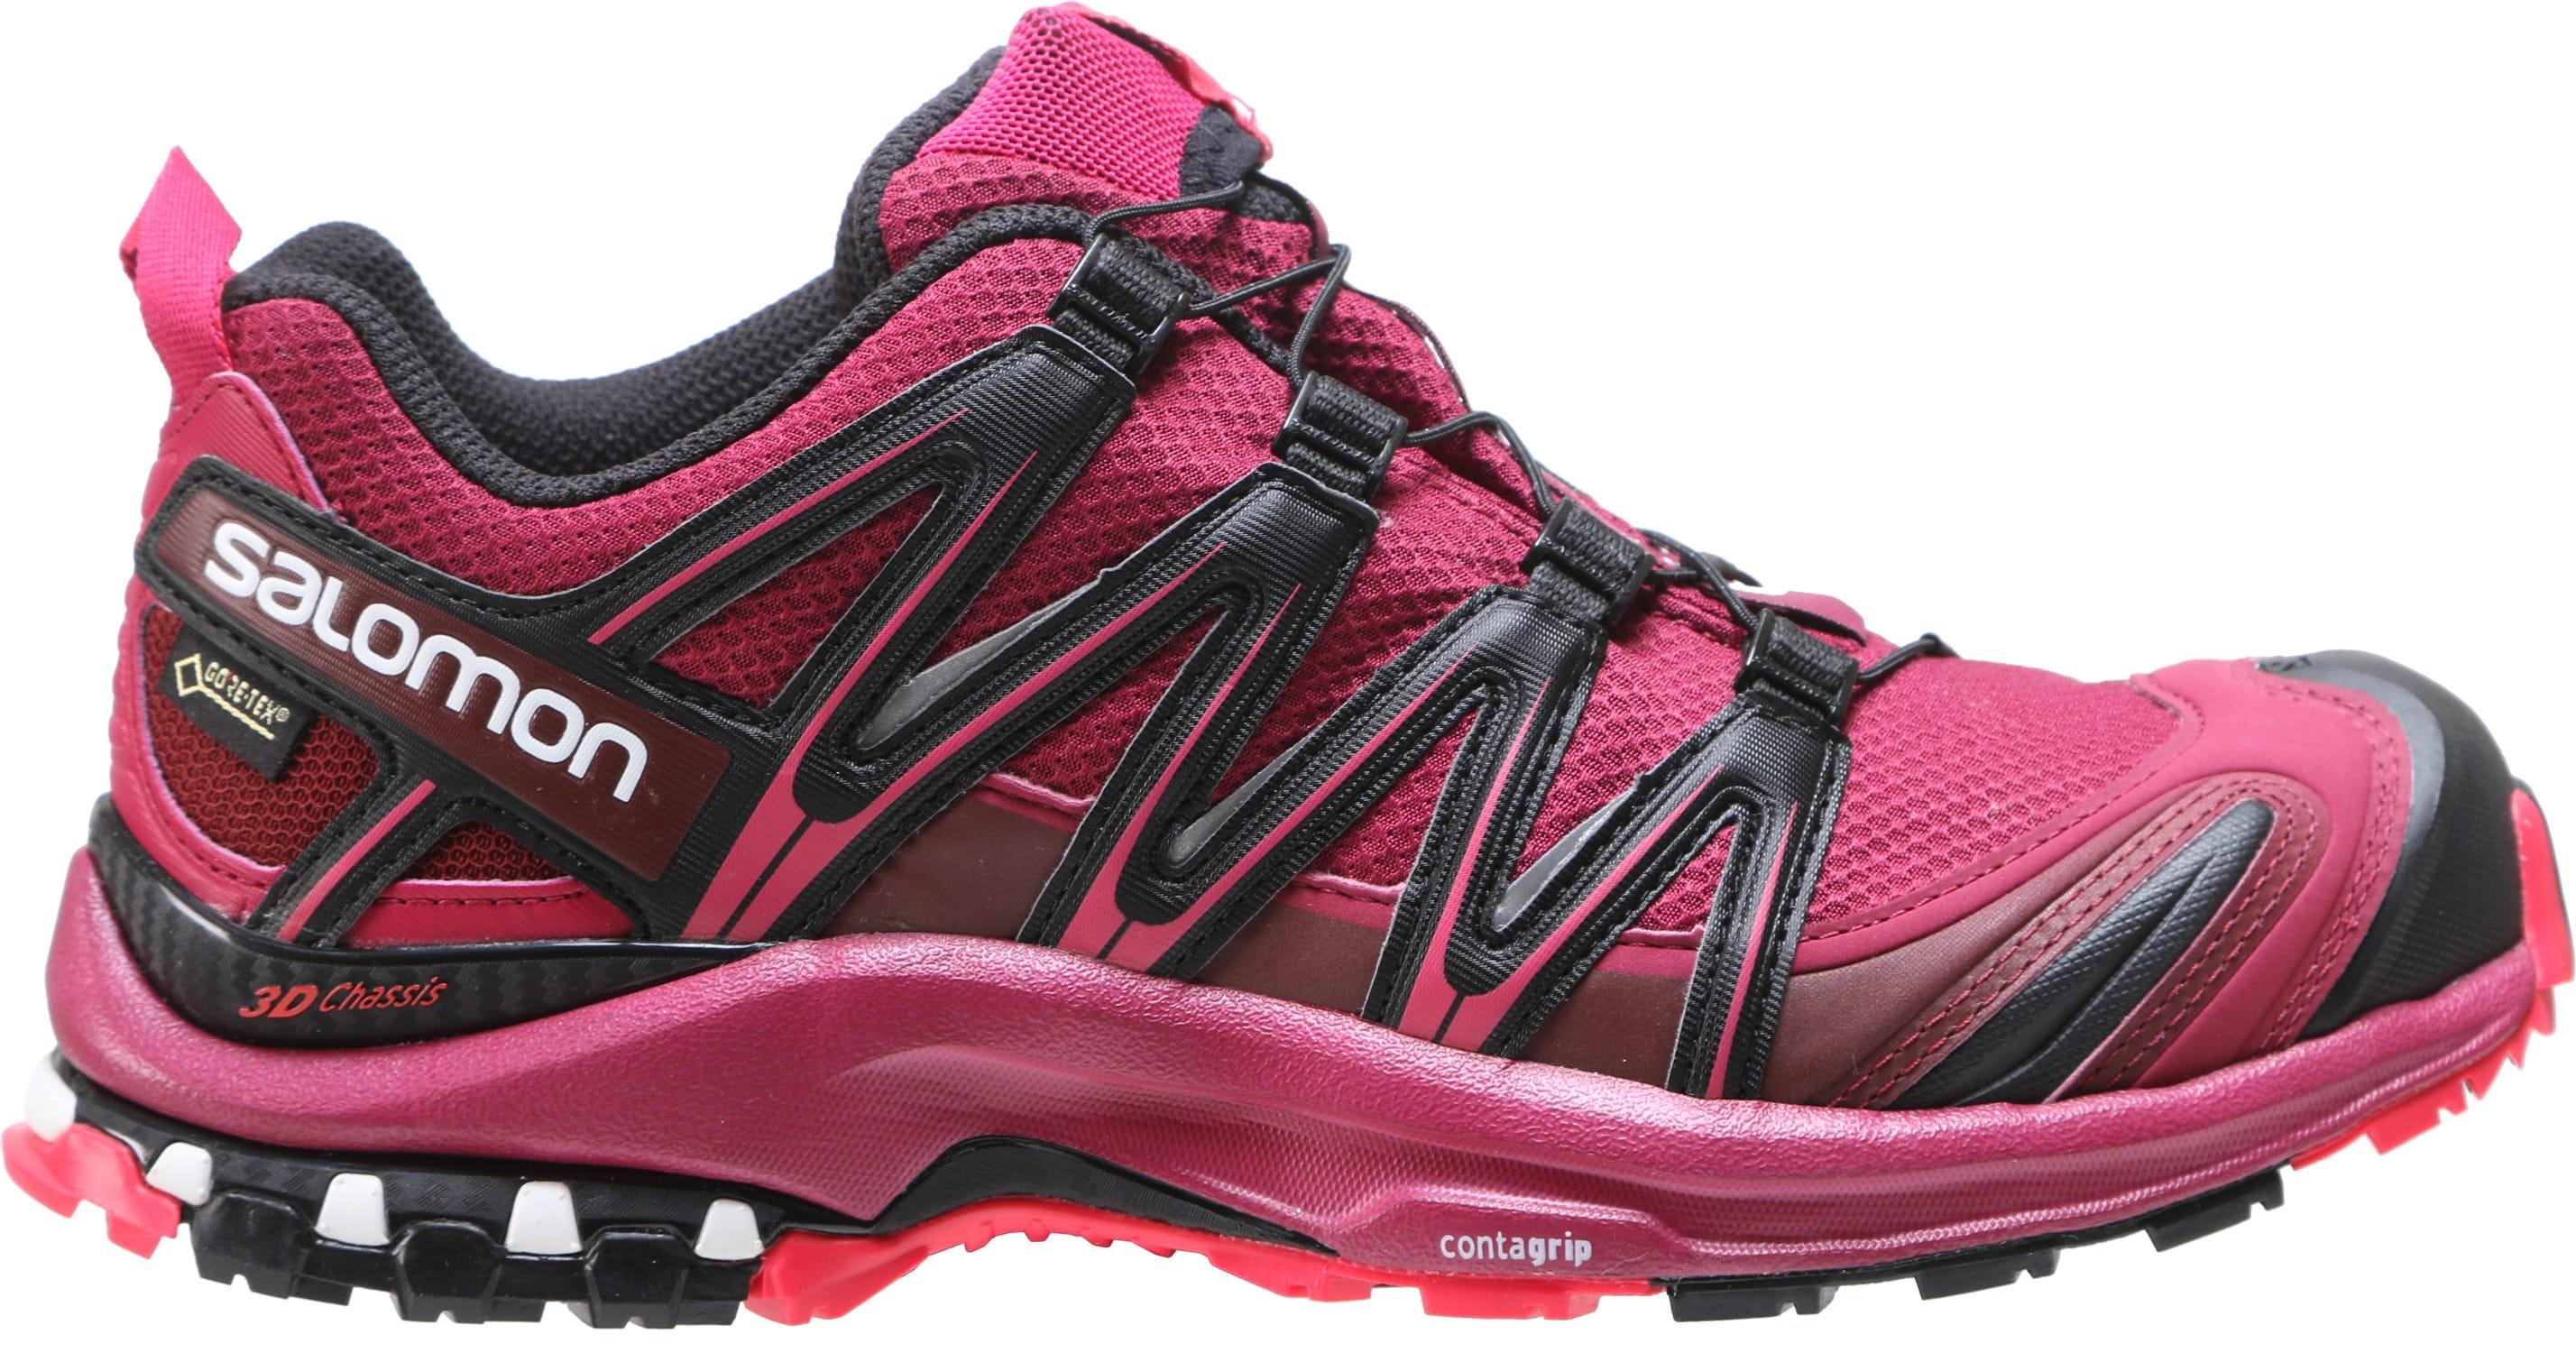 0470dc5fcd6 Salomon XA Pro 3D GTX Trail Running Shoes - thumbnail 1